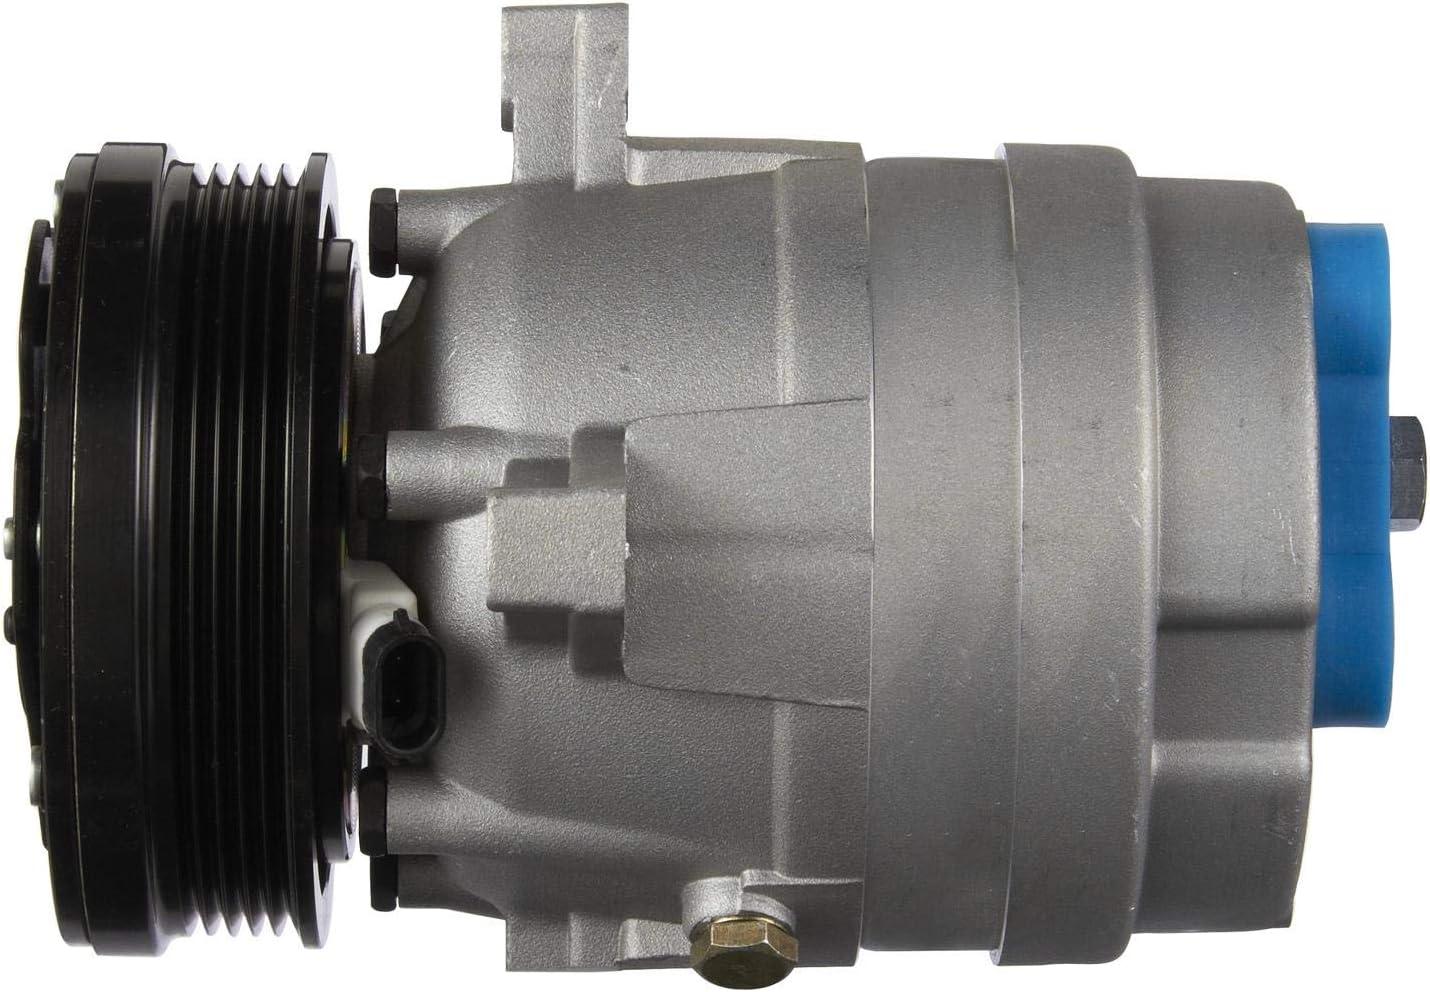 KLI74-10109 Klimoto Compressor fits Buick Skylark Chevrolet Oldsmobile Achieva Pontiac Grand Am